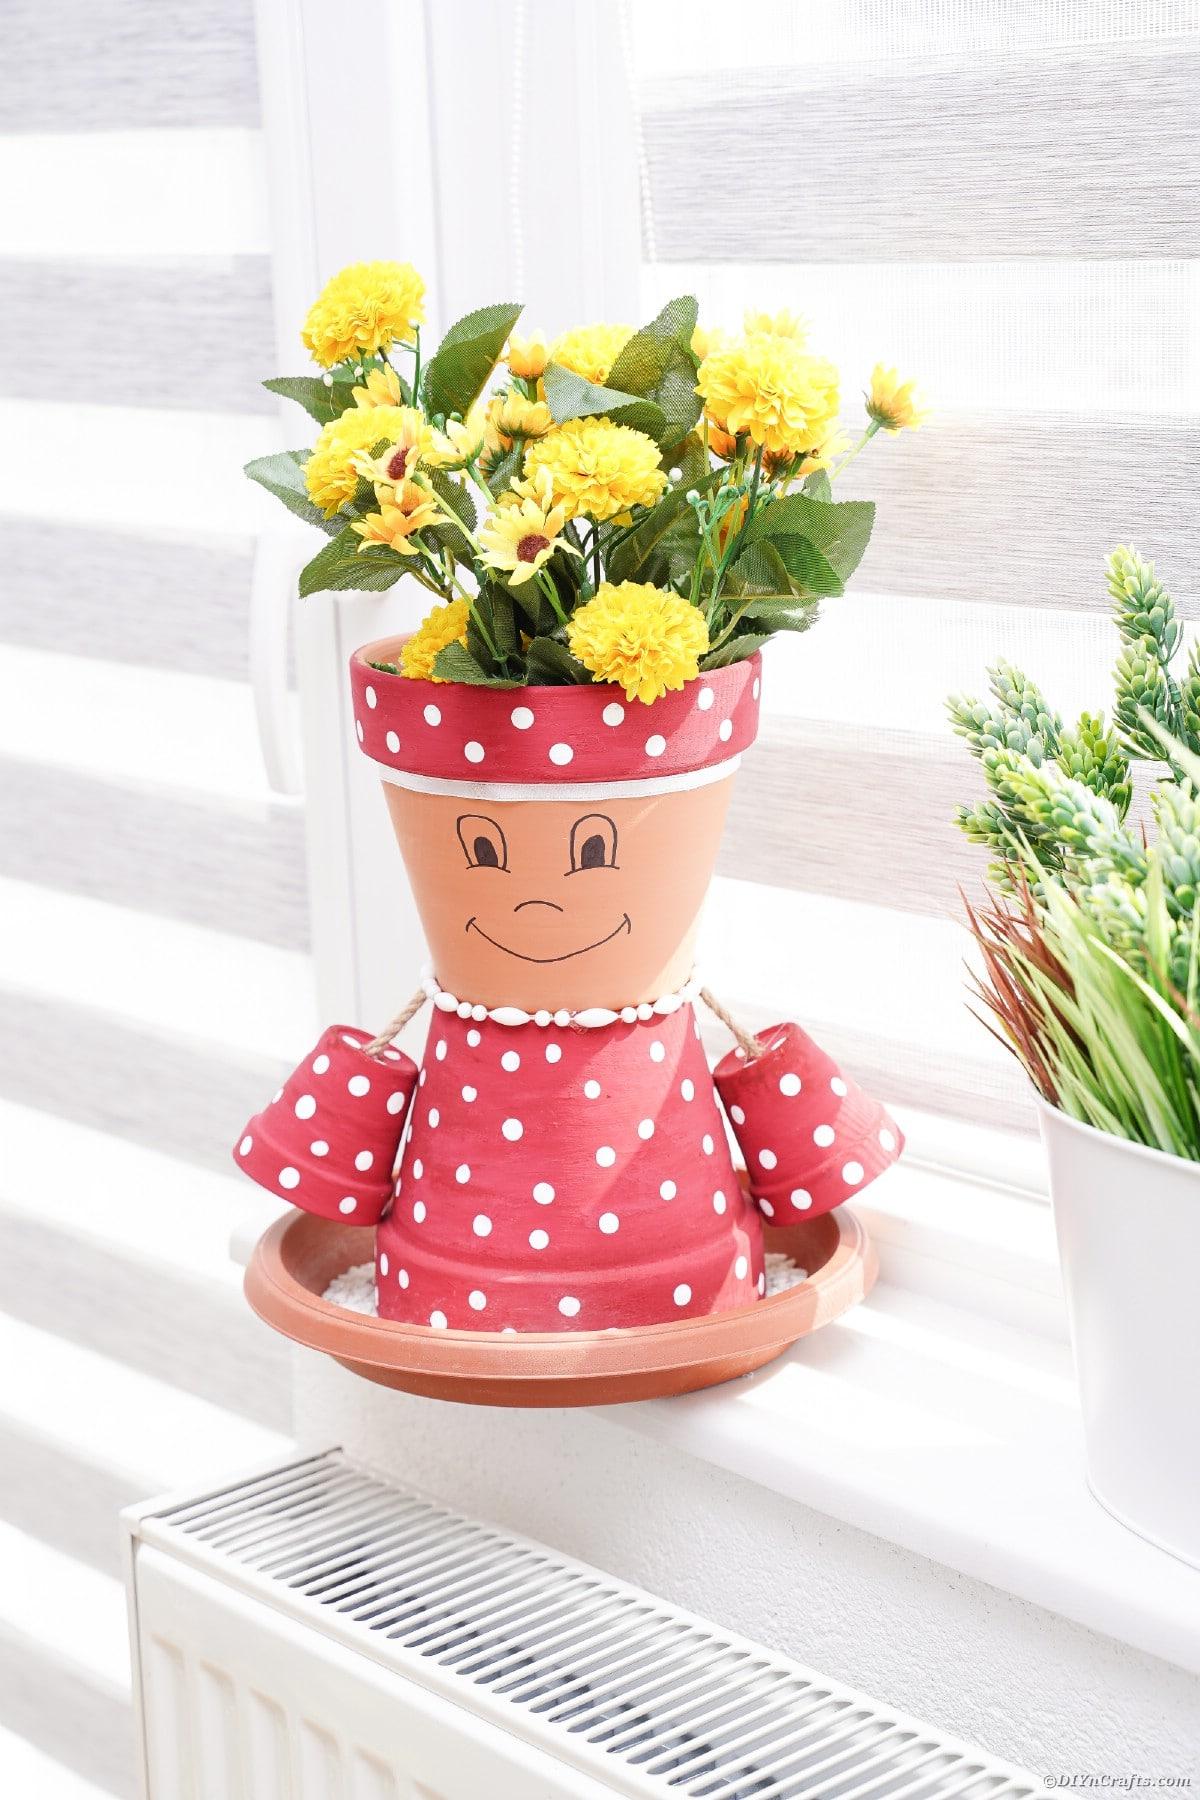 Pink polka dot flower pot in windowsill